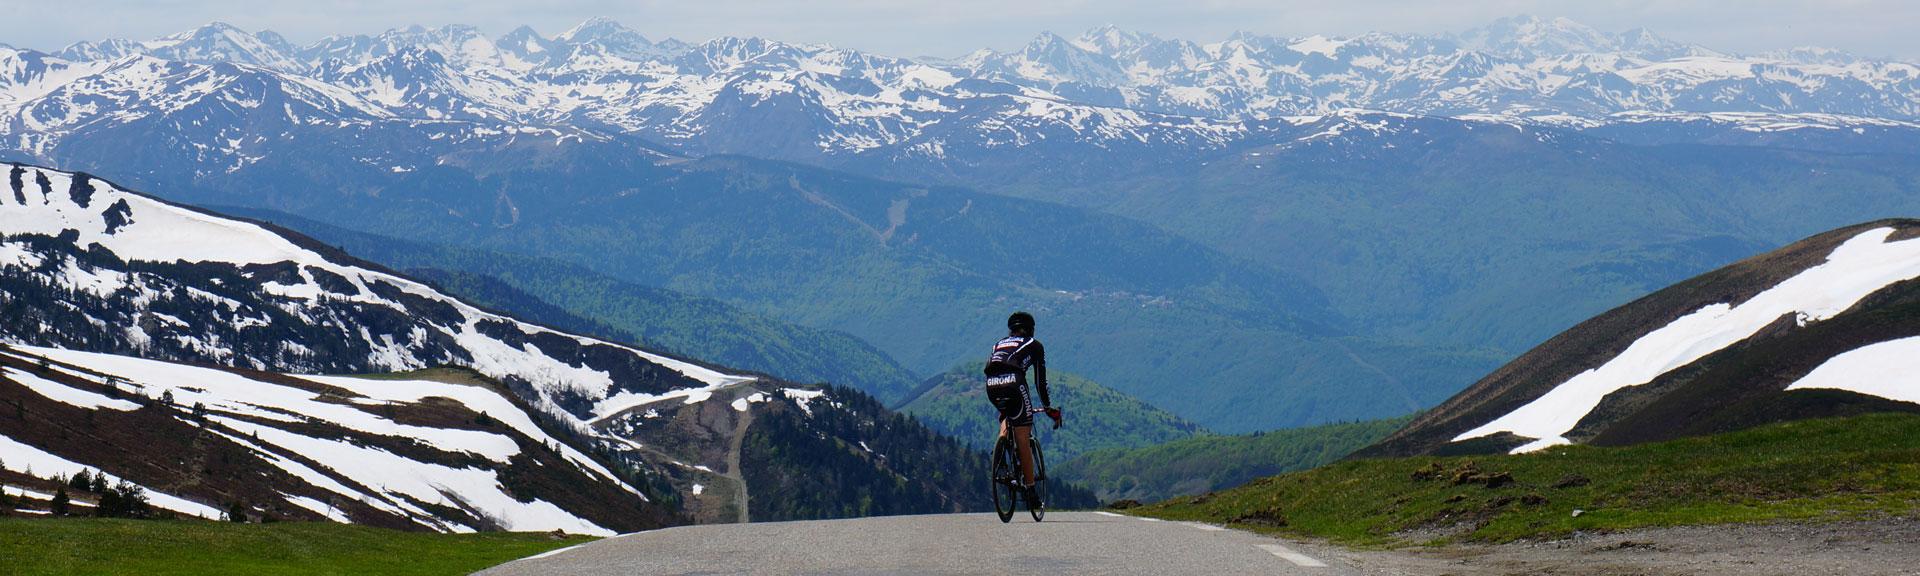 Bikecat Cycling Tours - Col du Pailheres - Pyrenees